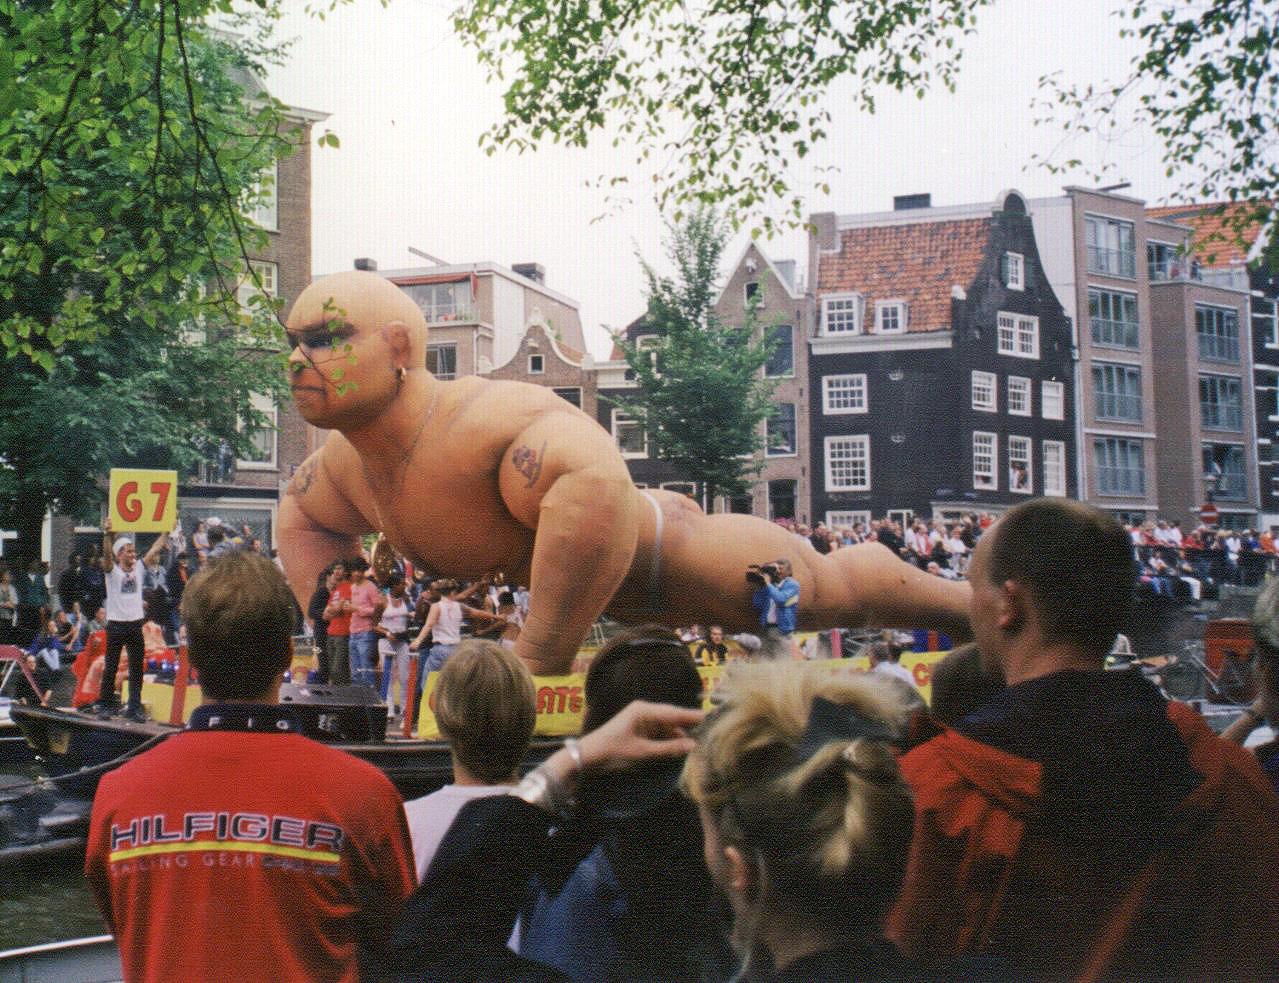 Amsterdam sex clubs gay cruising guidemisterbb